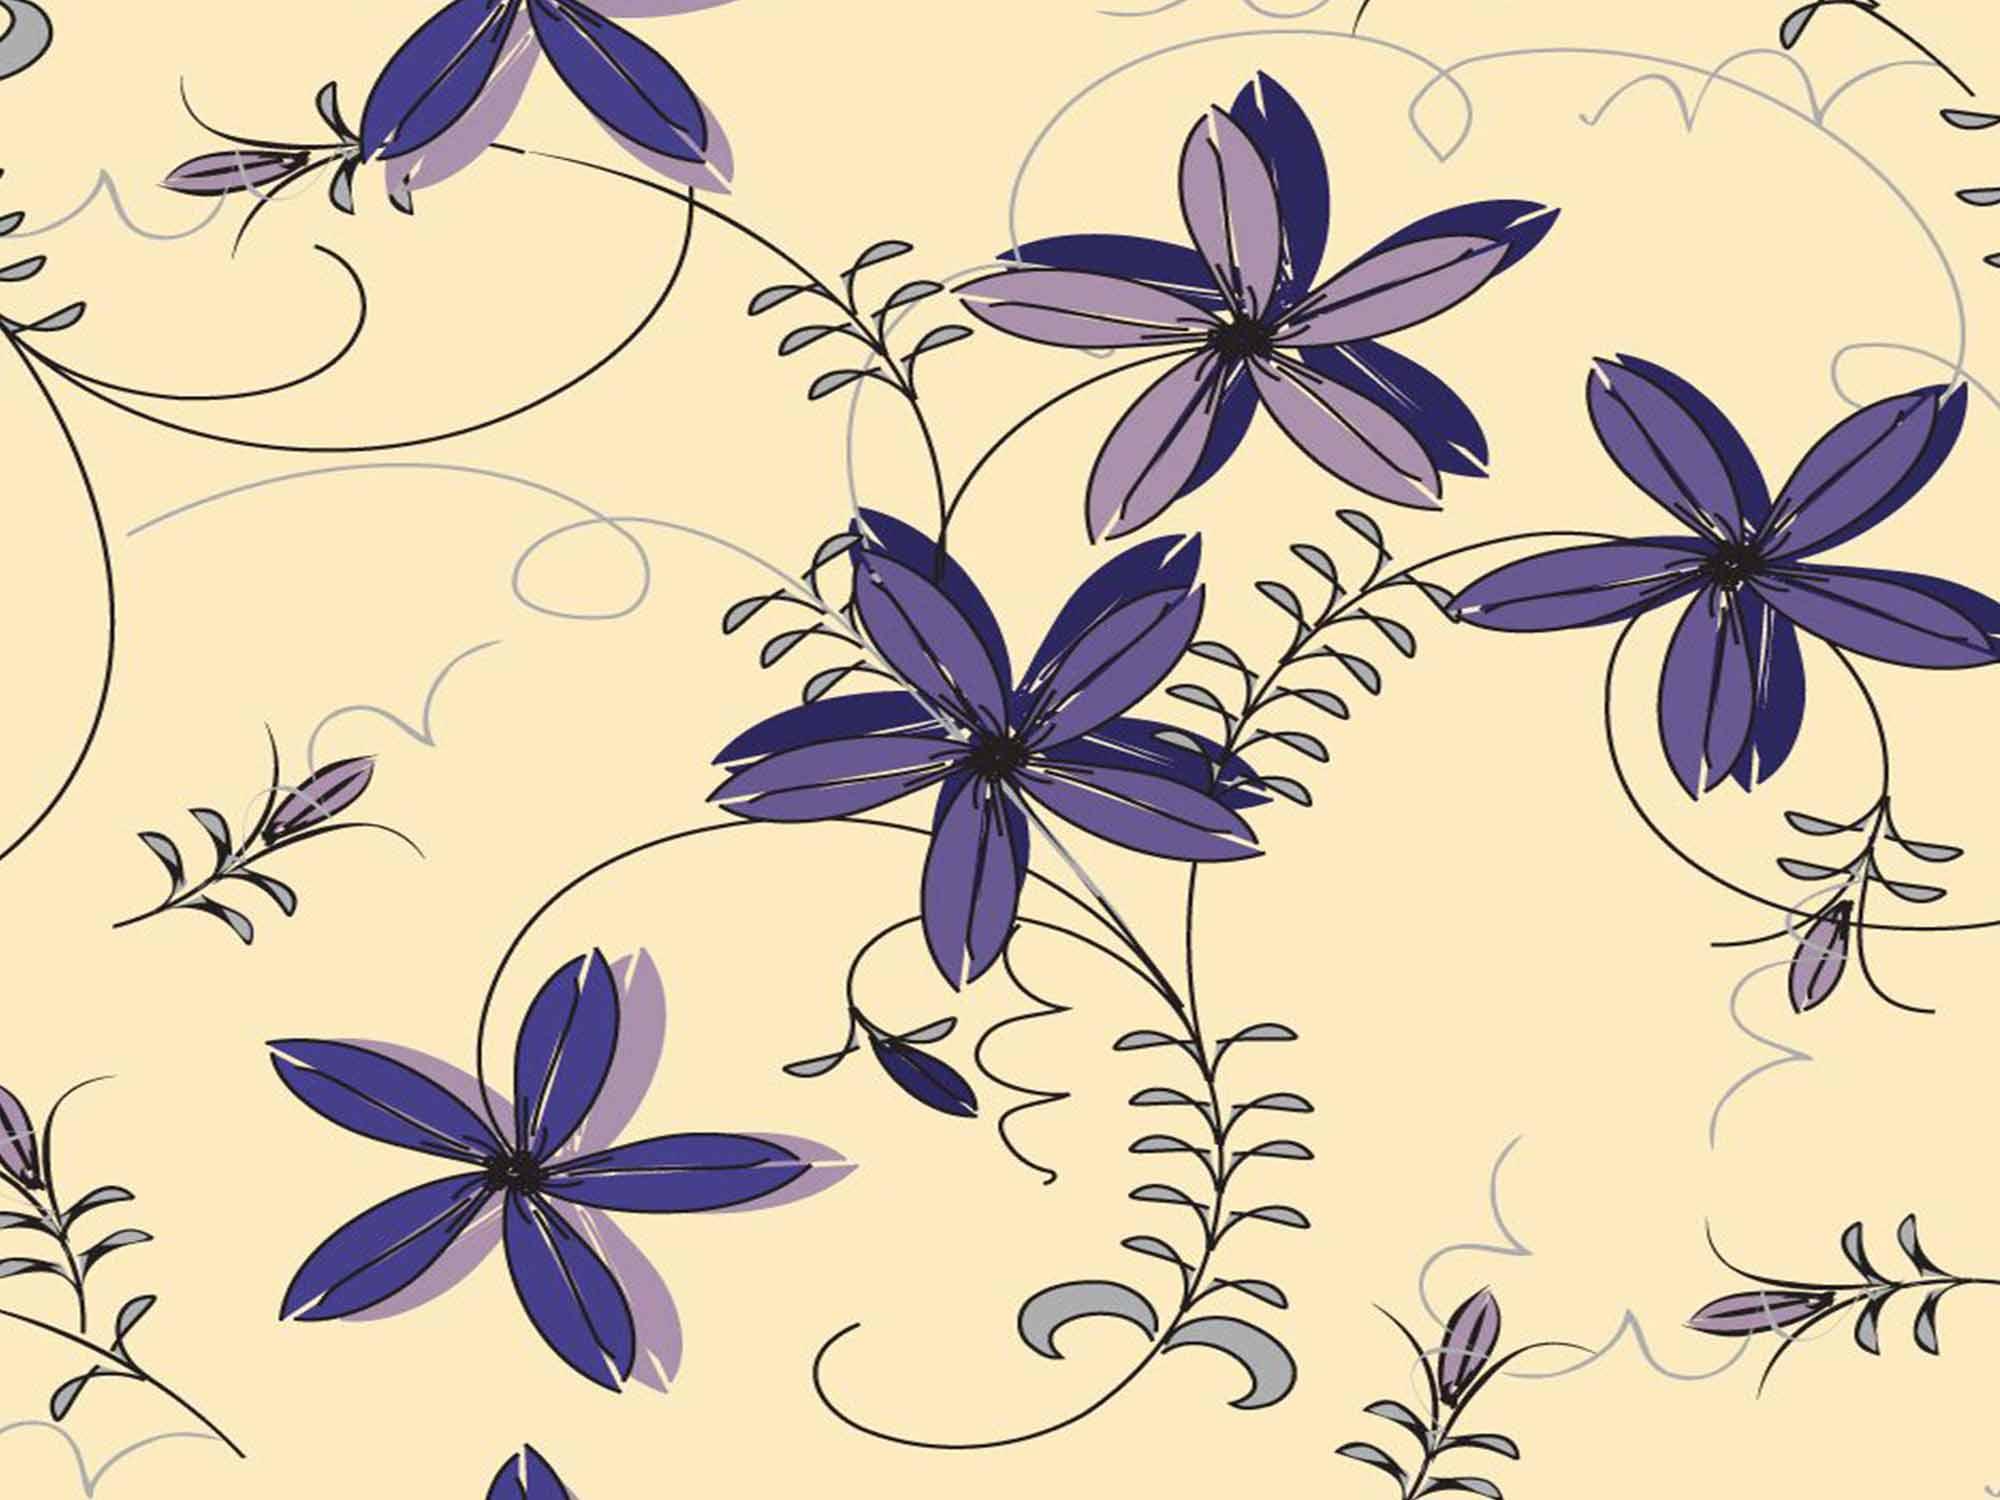 Papel de Parede Floral 0018 - Adesivos de Parede  - Paredes Decoradas